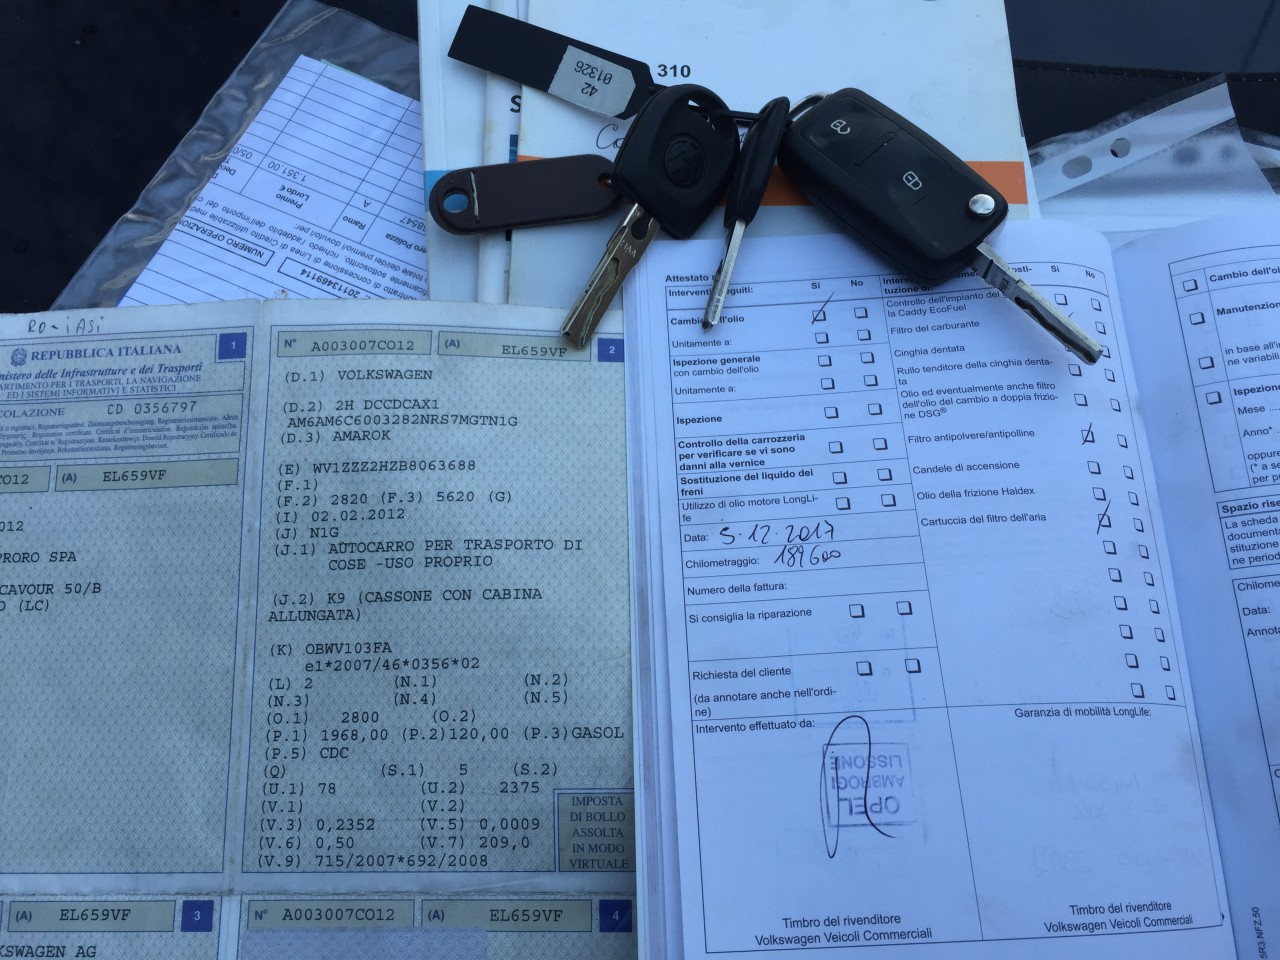 VW Amarok 4 MOTION , EURO 5 2012